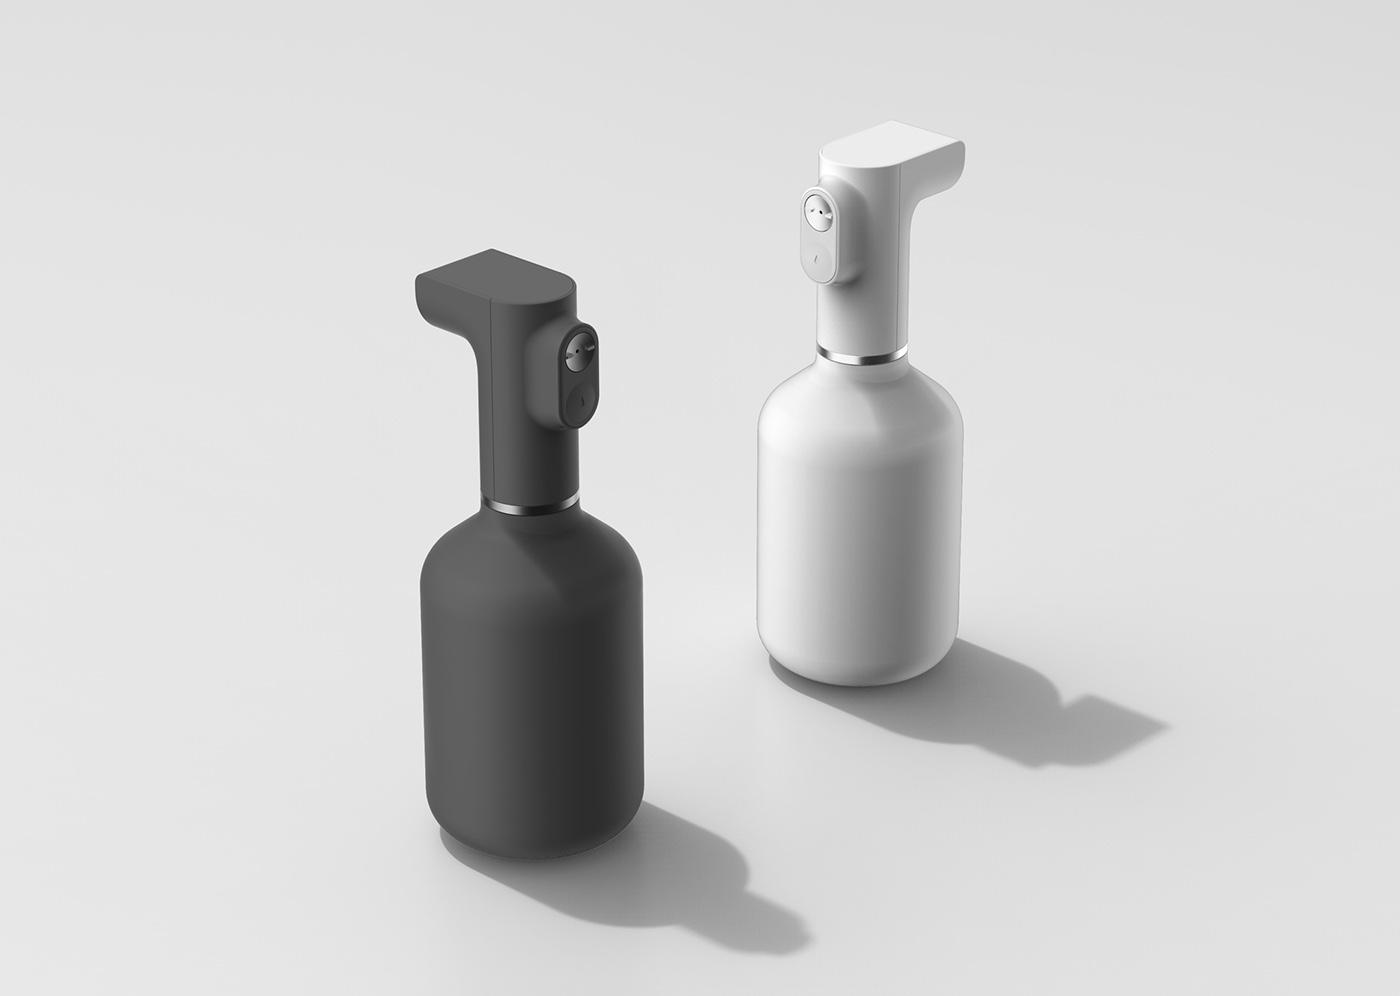 electric sprayer auto pump designmelt Melt bottle